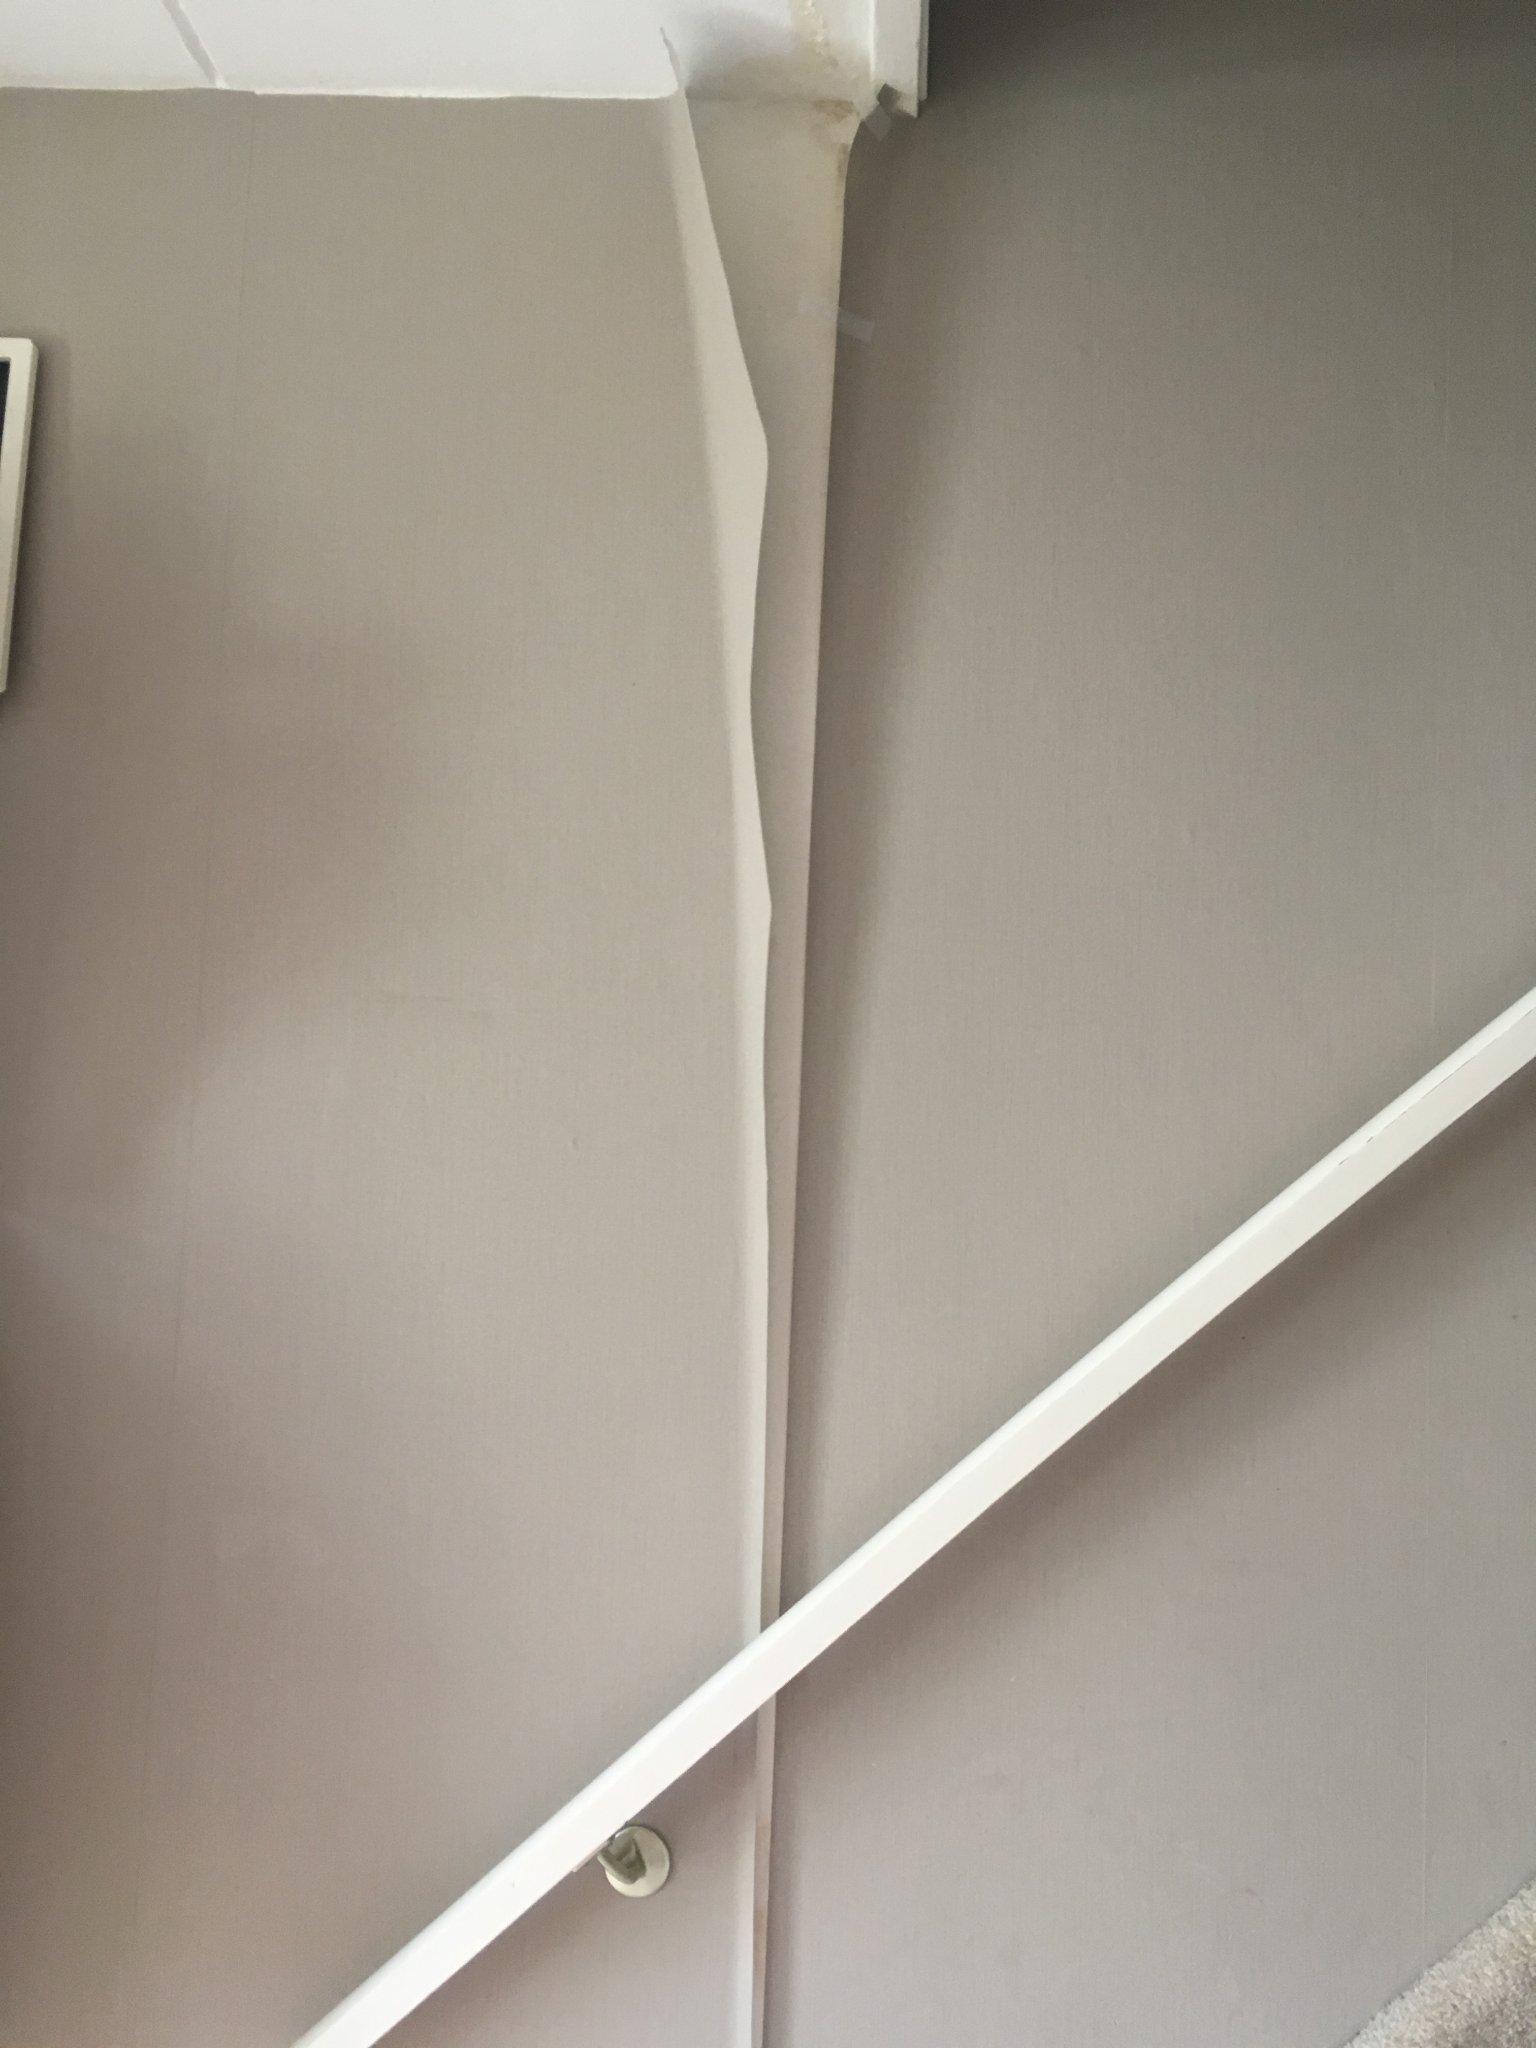 Lekkage badkamer repareren + herstellen schade - Werkspot